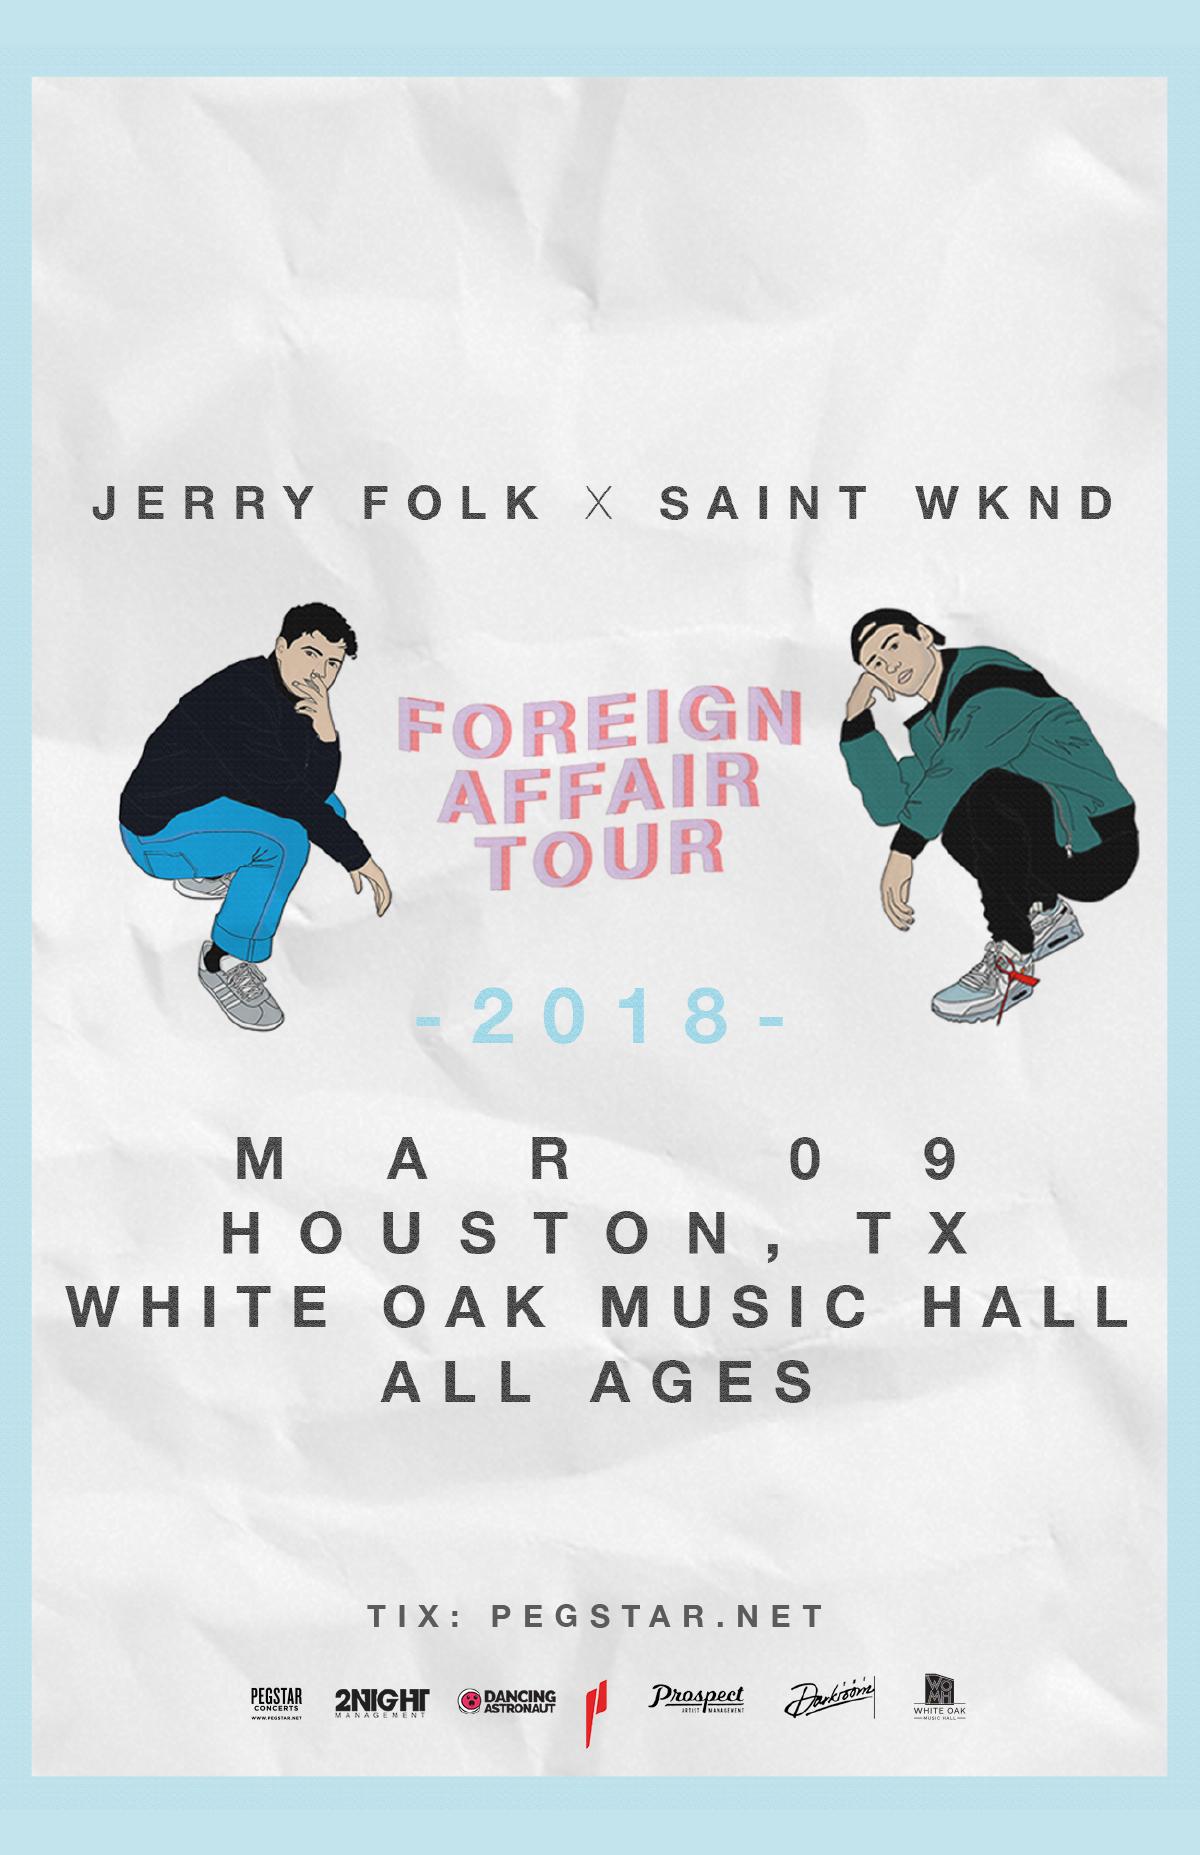 Jerry Folk & SAINT WKND